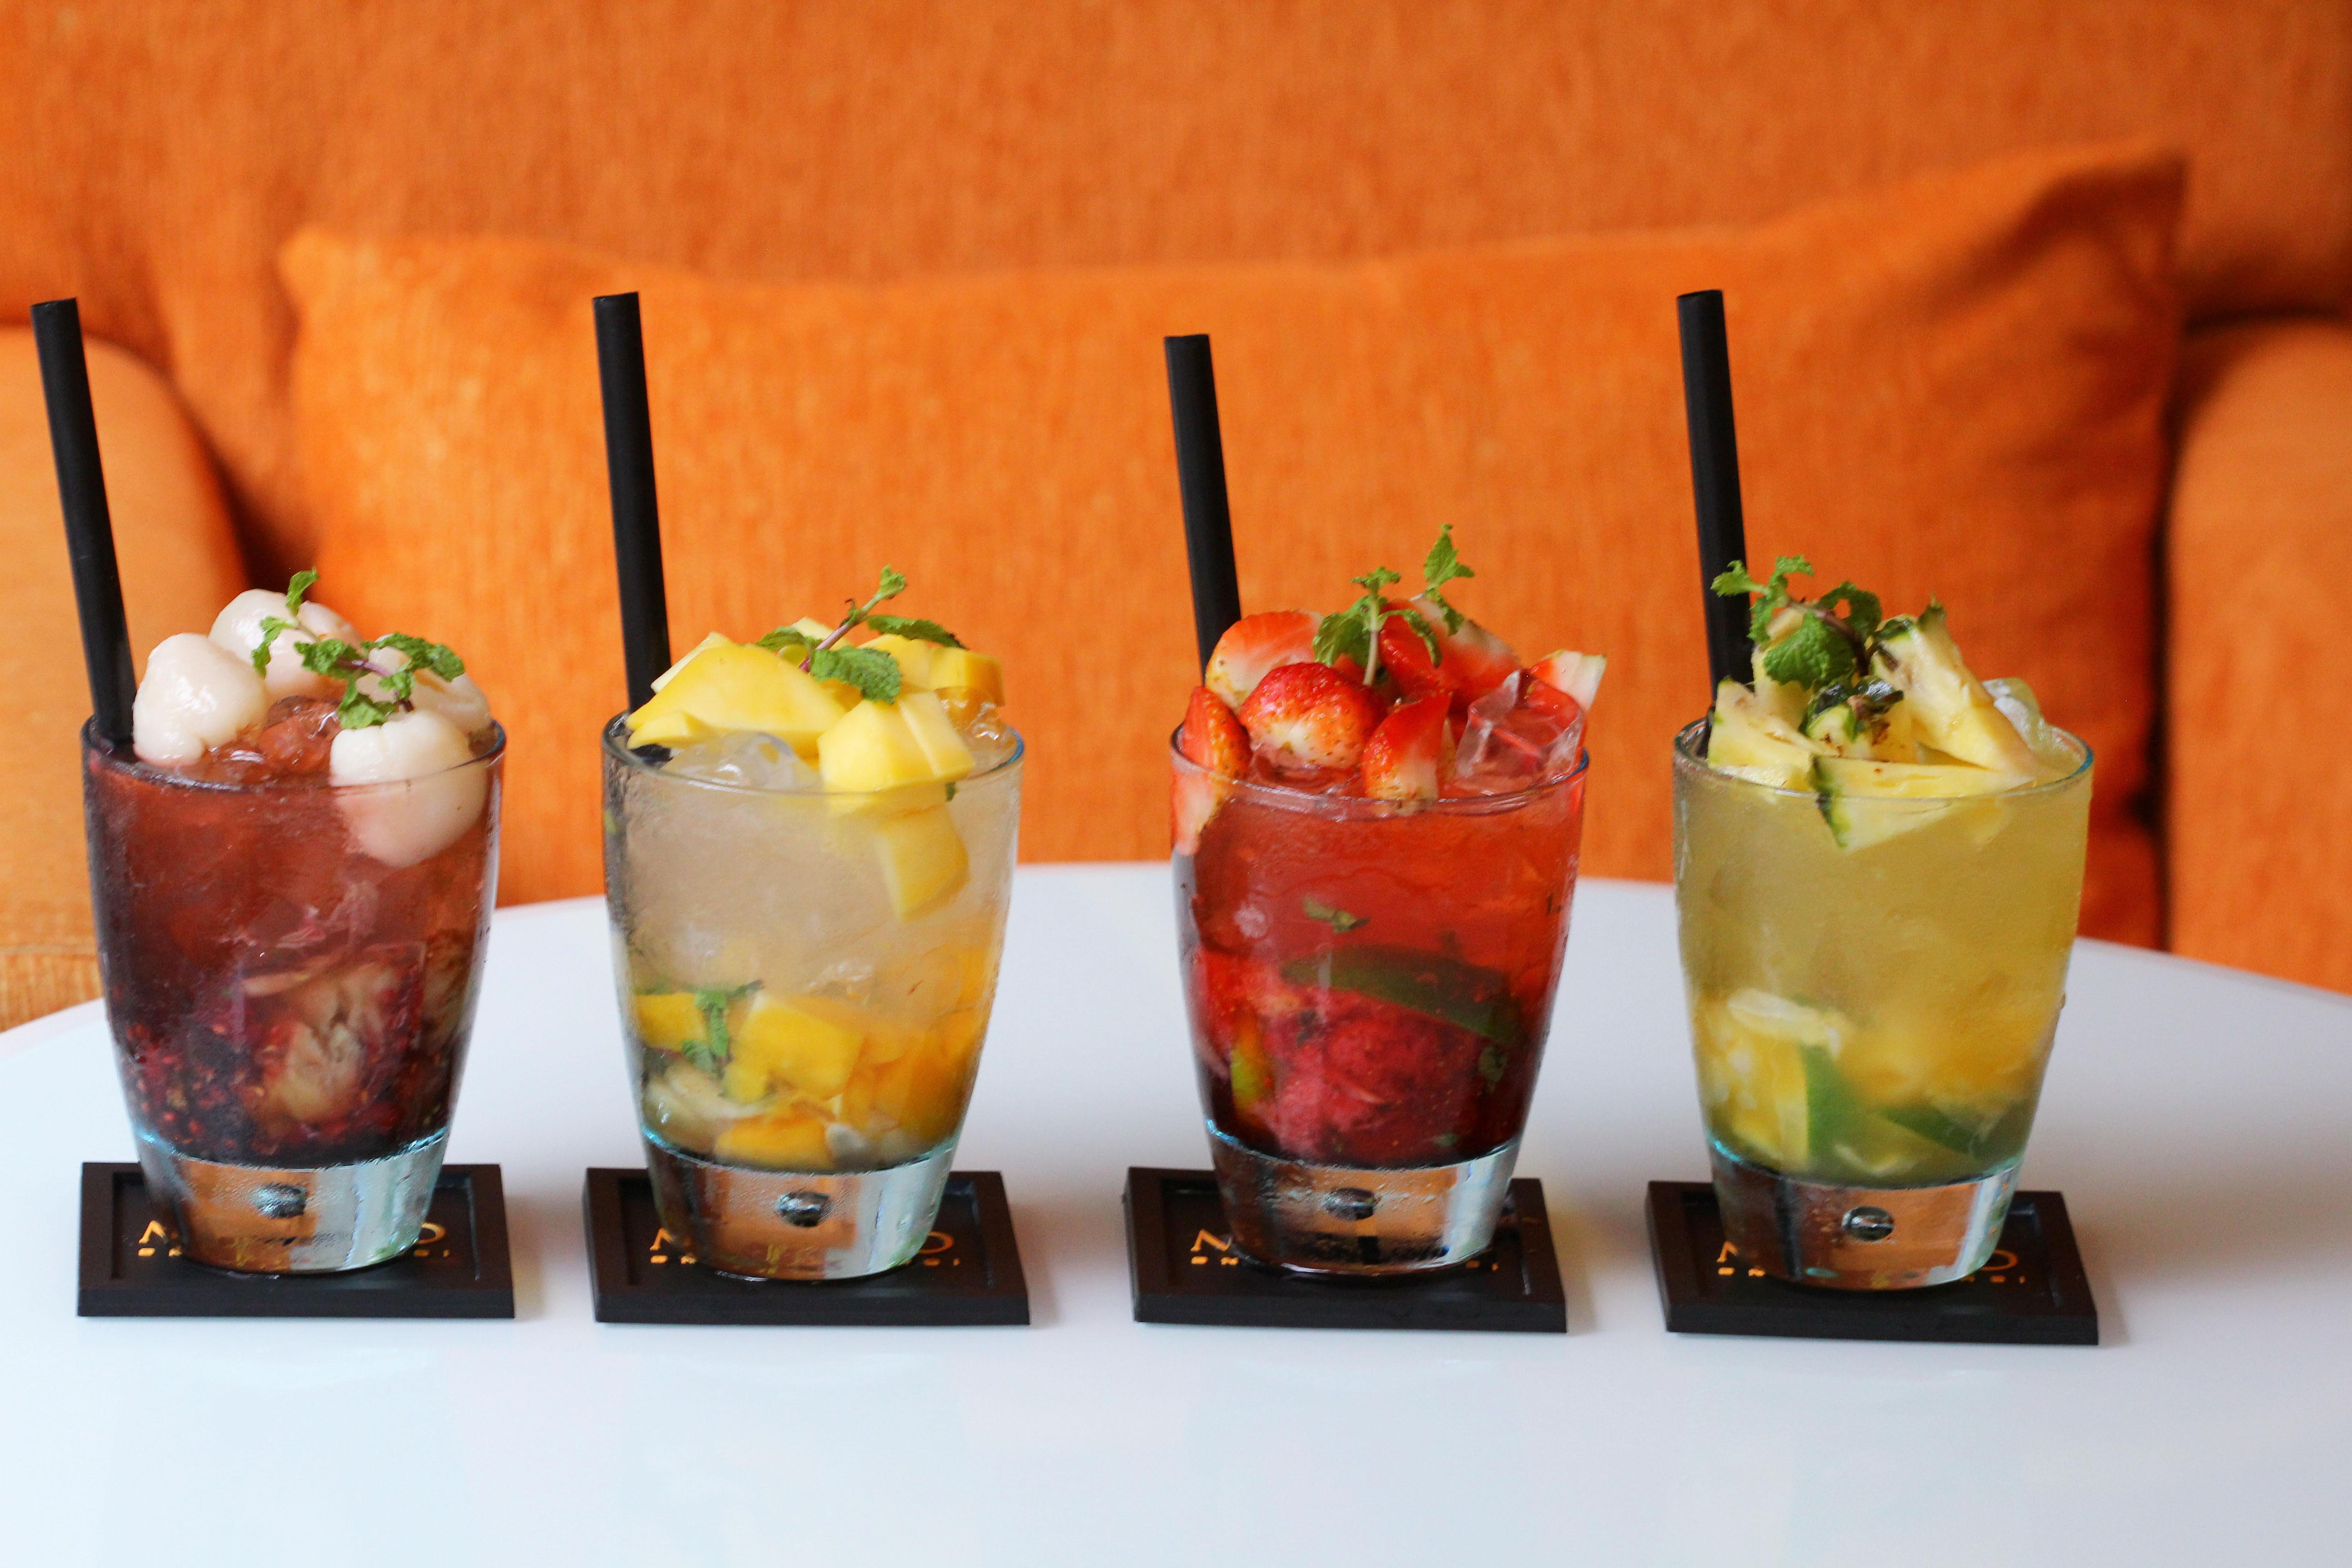 Sheraton Saigon - ẩm thực Tết sepecial menu - elle vietnam 11